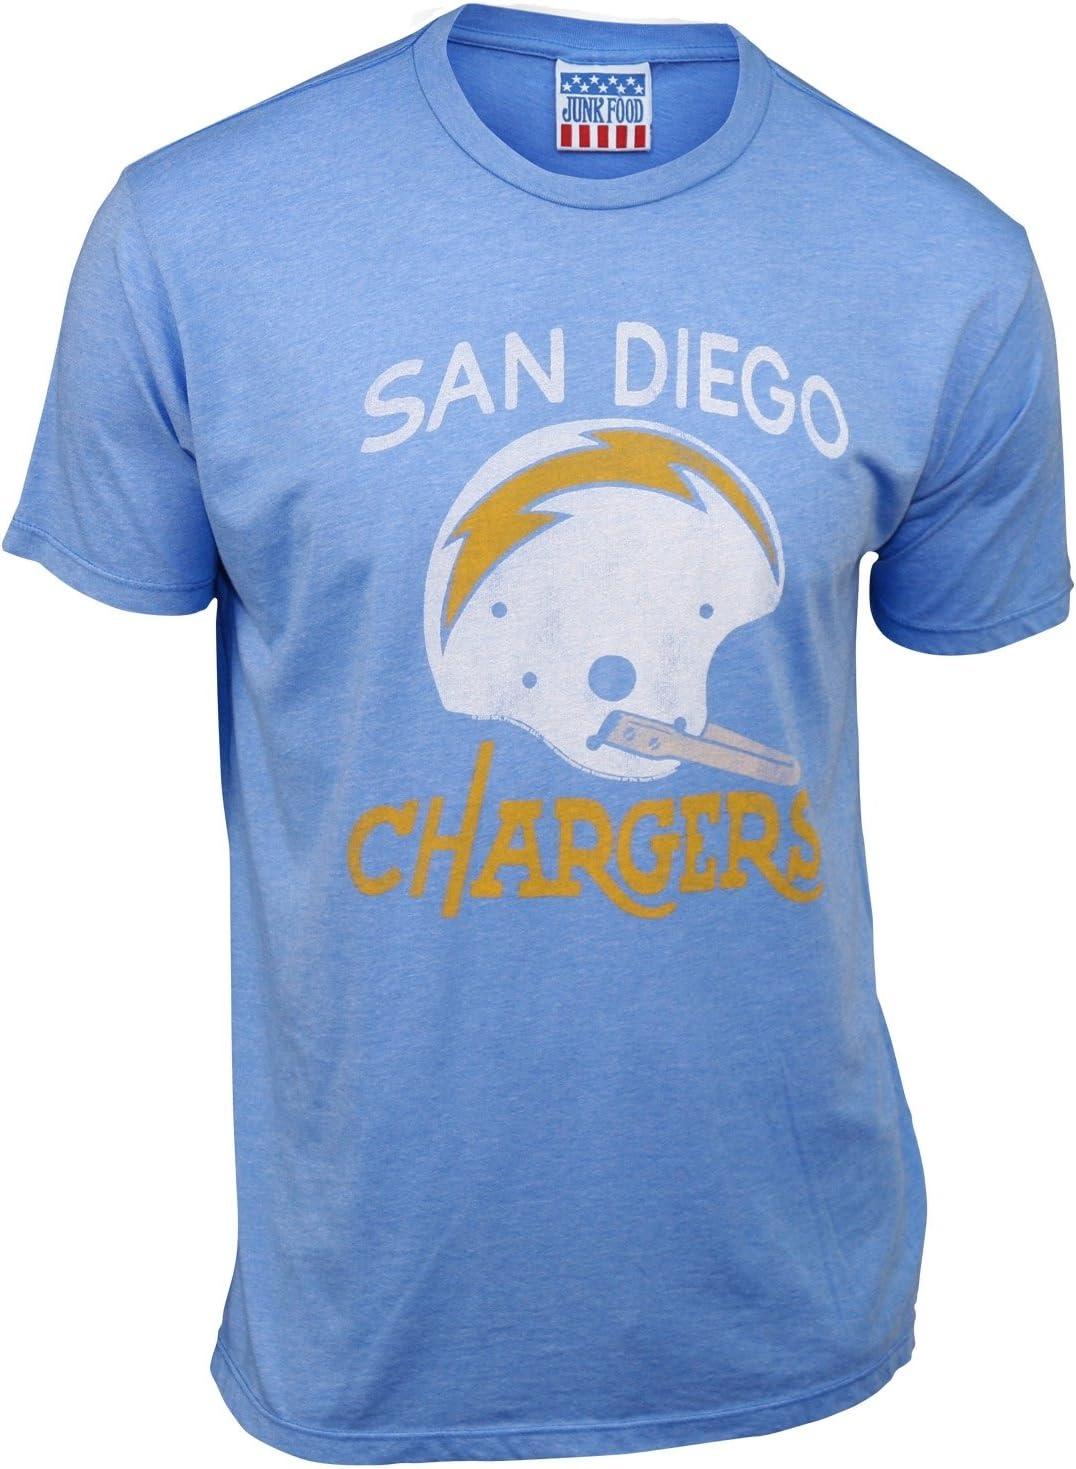 San Diego Chargers Men's Retro Vintage T-Shirt